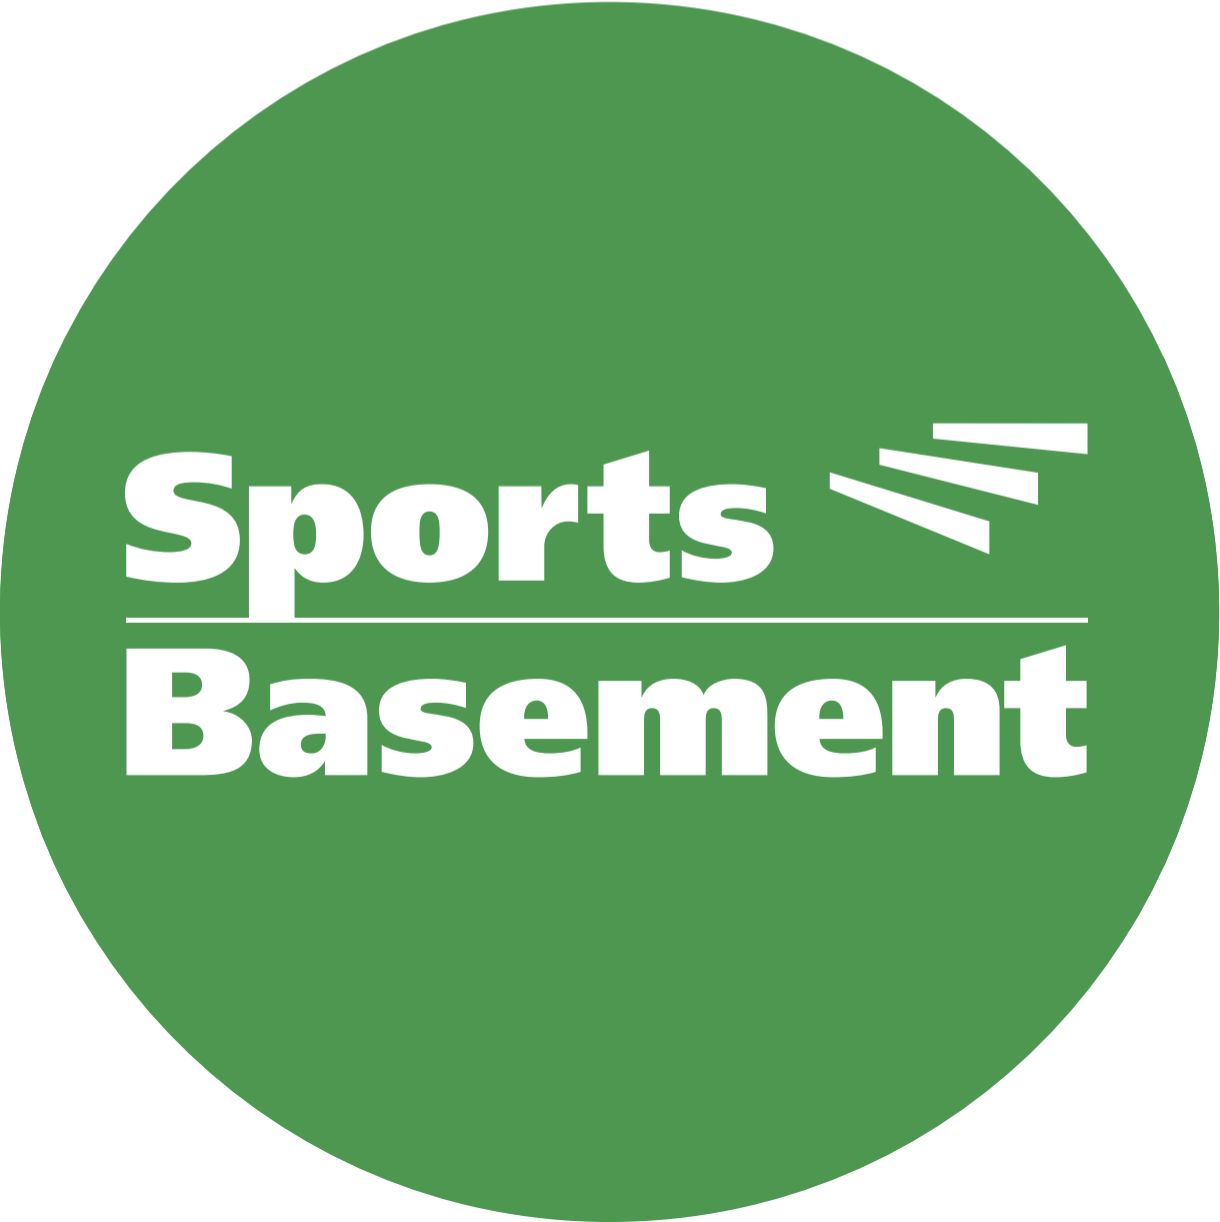 Sports Basement logo